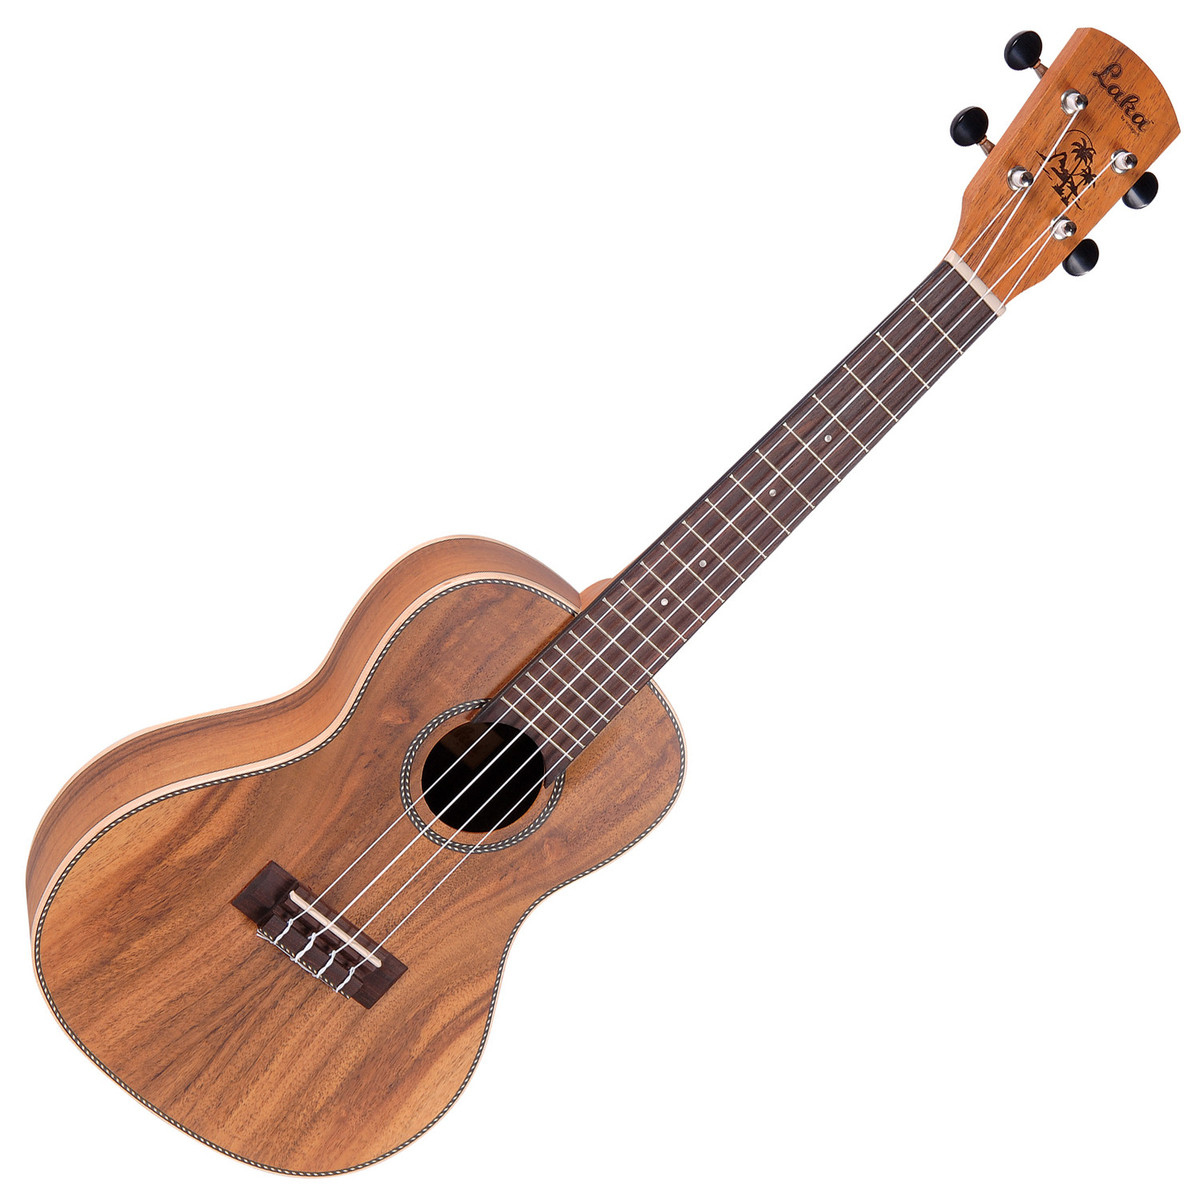 Laka VUC40 concert ukulelė